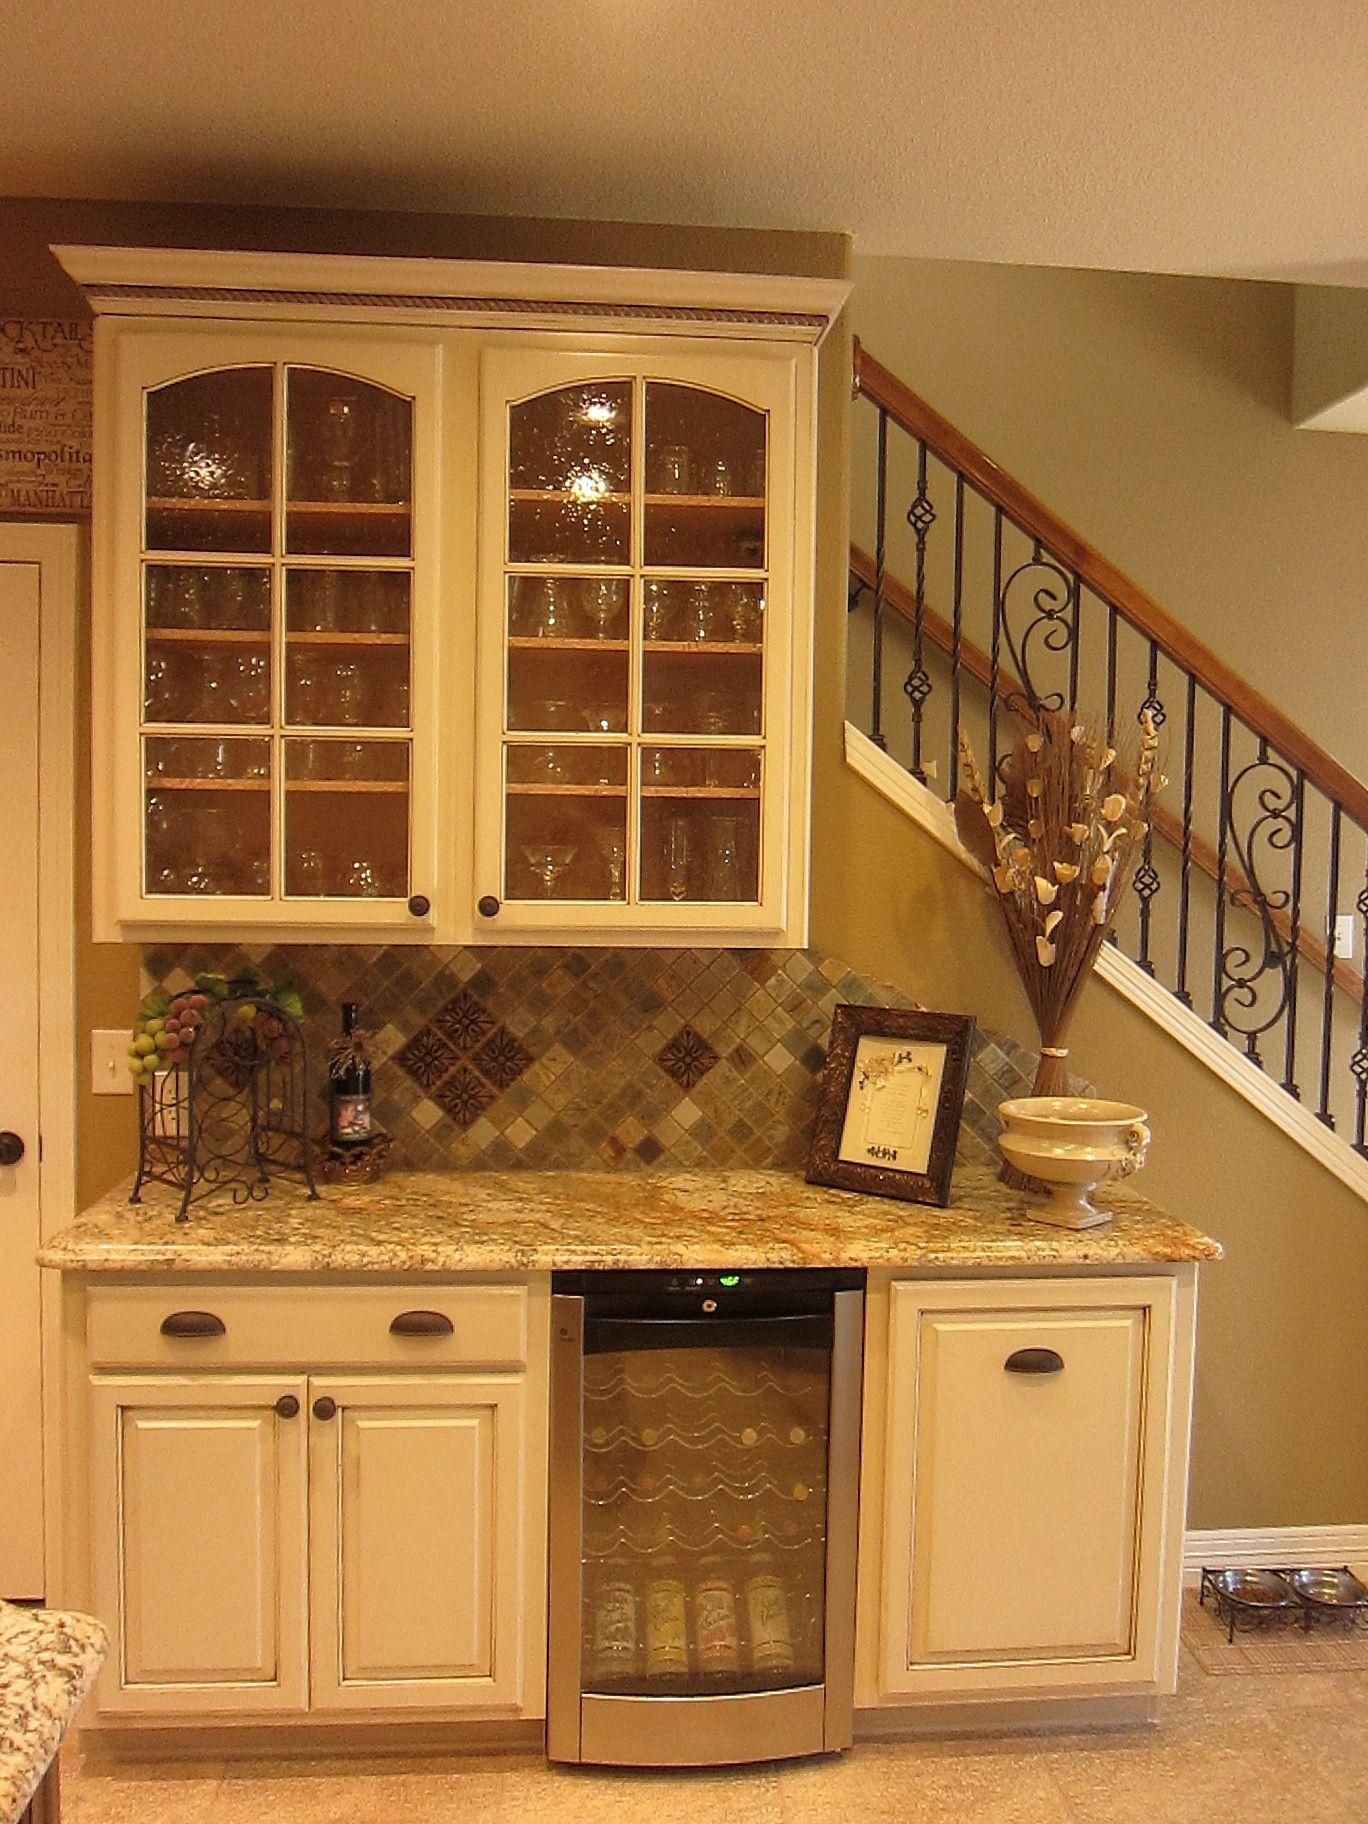 Beverage center by LoneStar Property Solutions | Kitchen redo